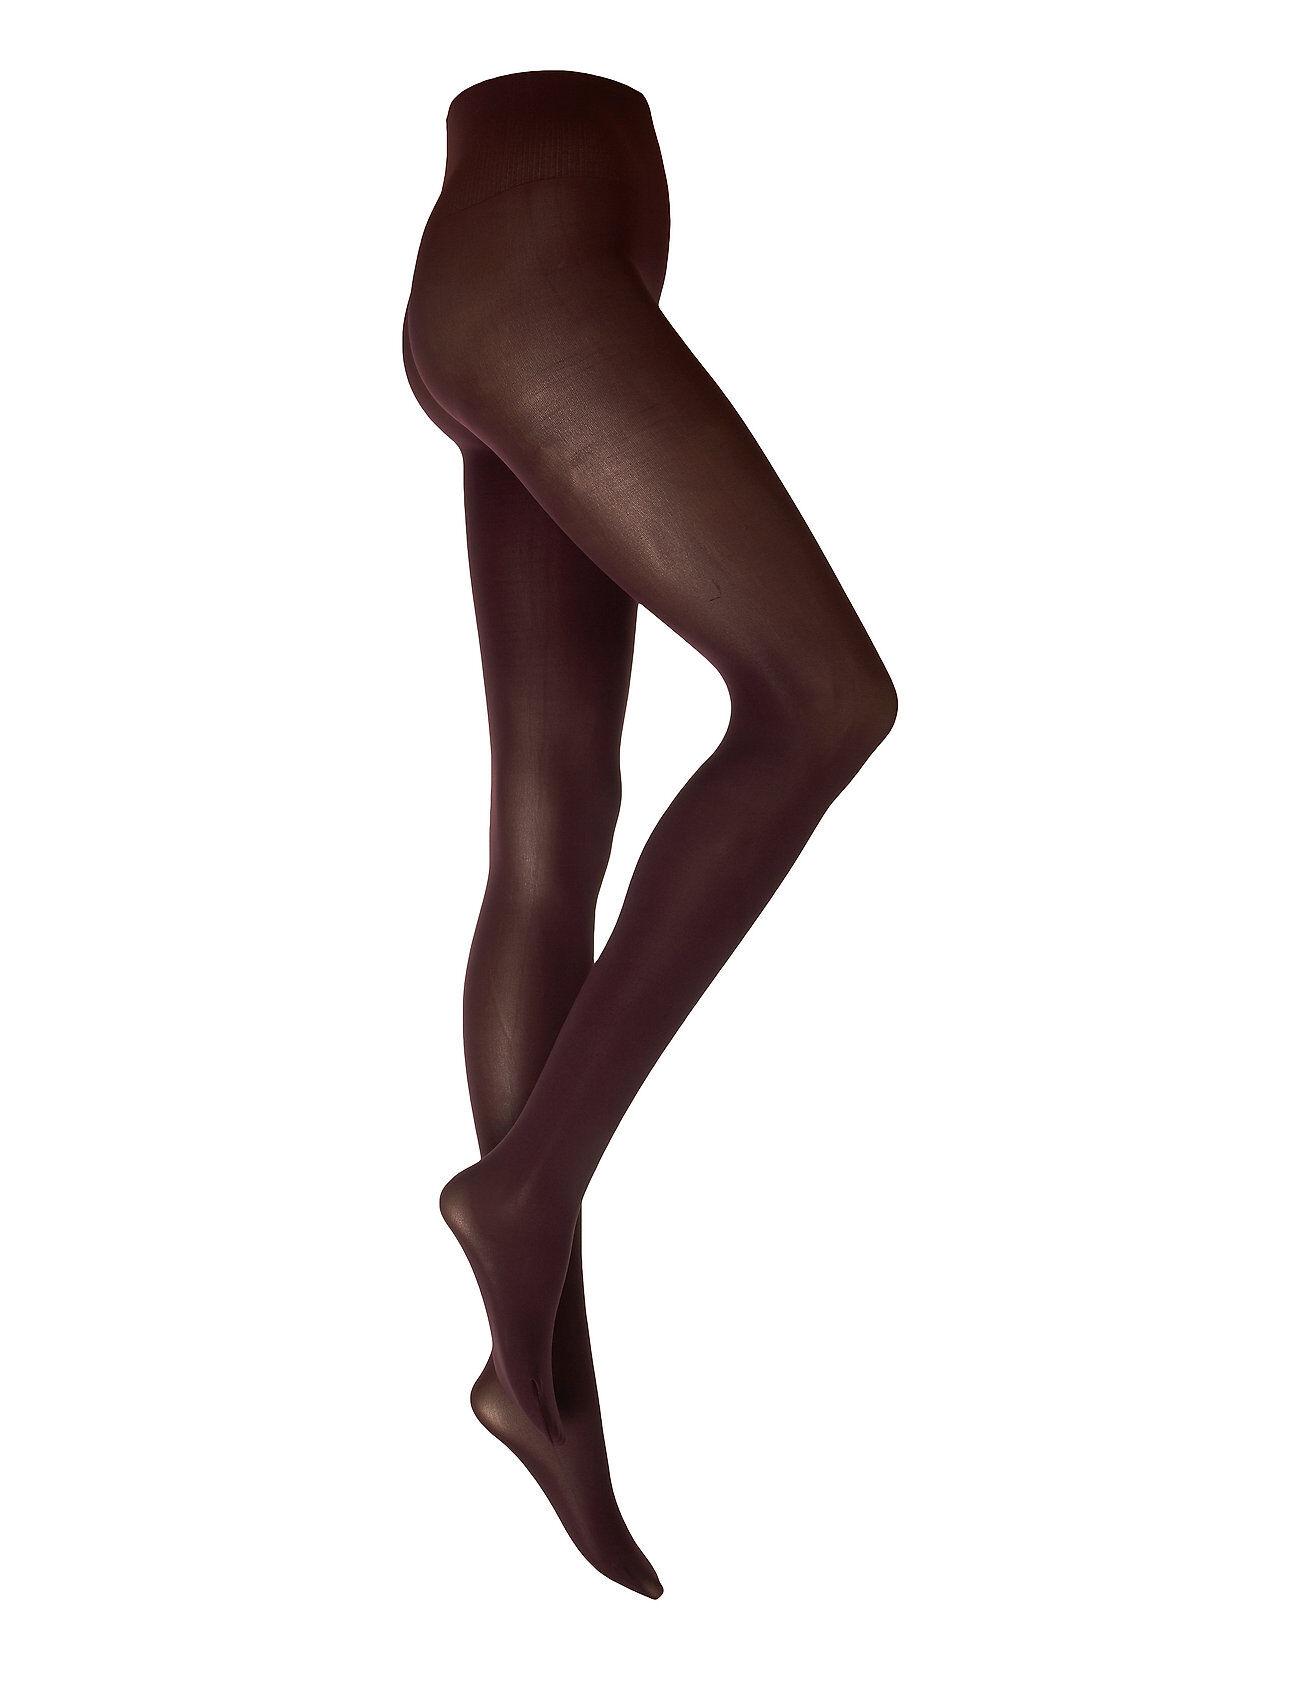 Swedish Stockings Olivia Premium Tights 60d Sukkahousut Punainen Swedish Stockings